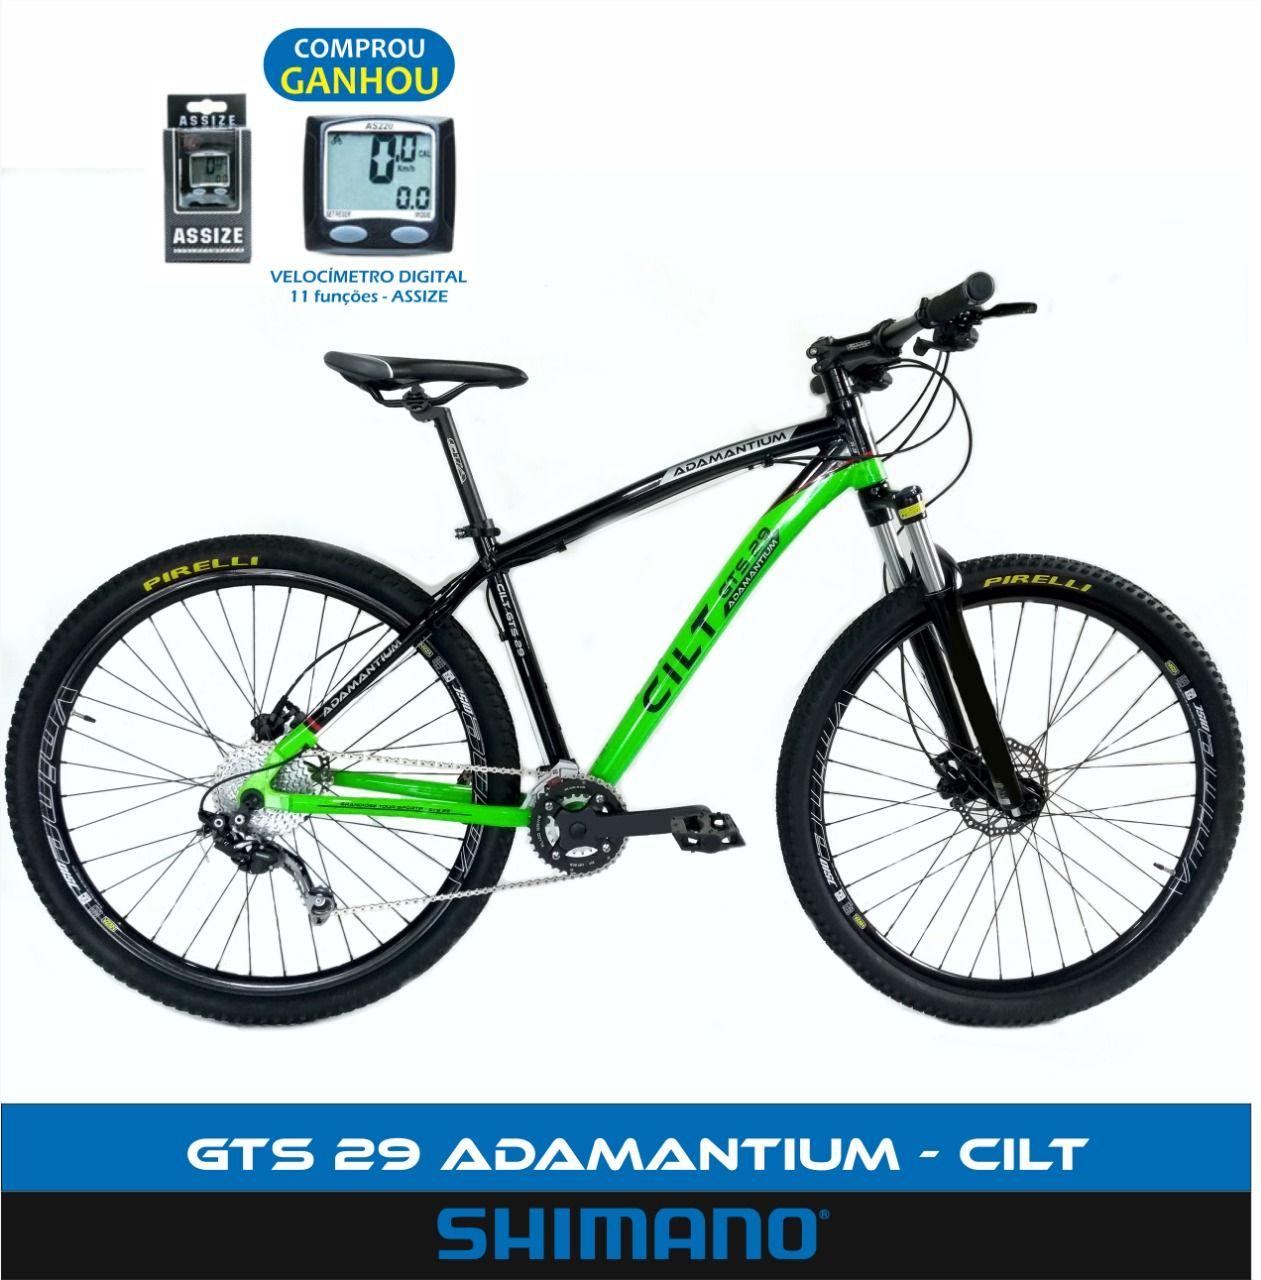 9a93ca1c7 Bicicleta 29 Gts Adamantium 27v Alivio Shimano Freio Hidráulico - Expert